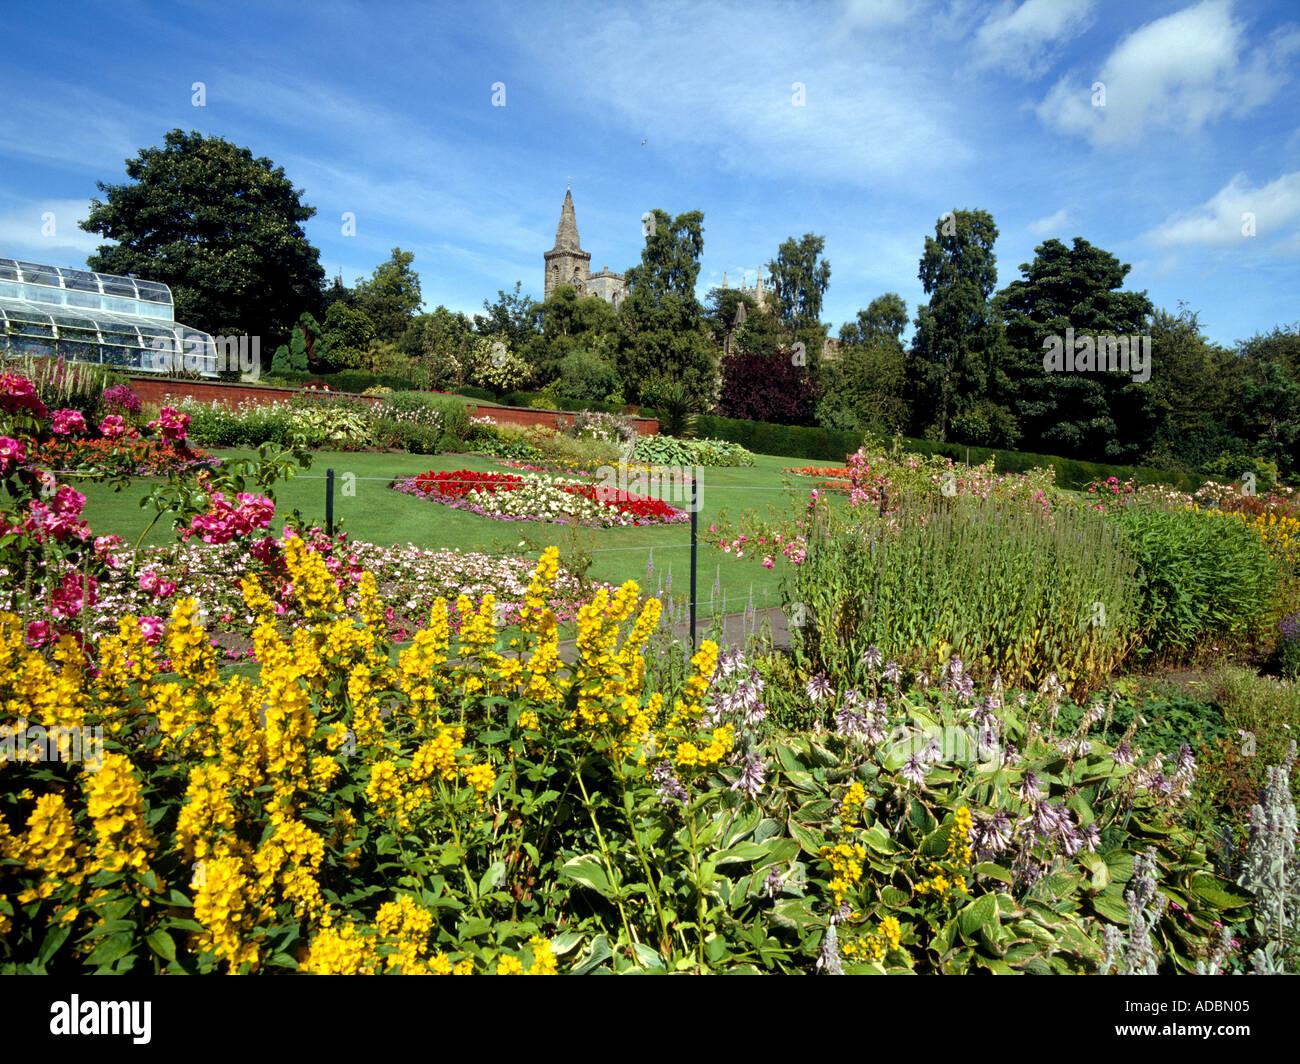 Pittencrief park DUNFERMLINE FIFE Flower gardens and Dunfermline Abbey Stock Photo